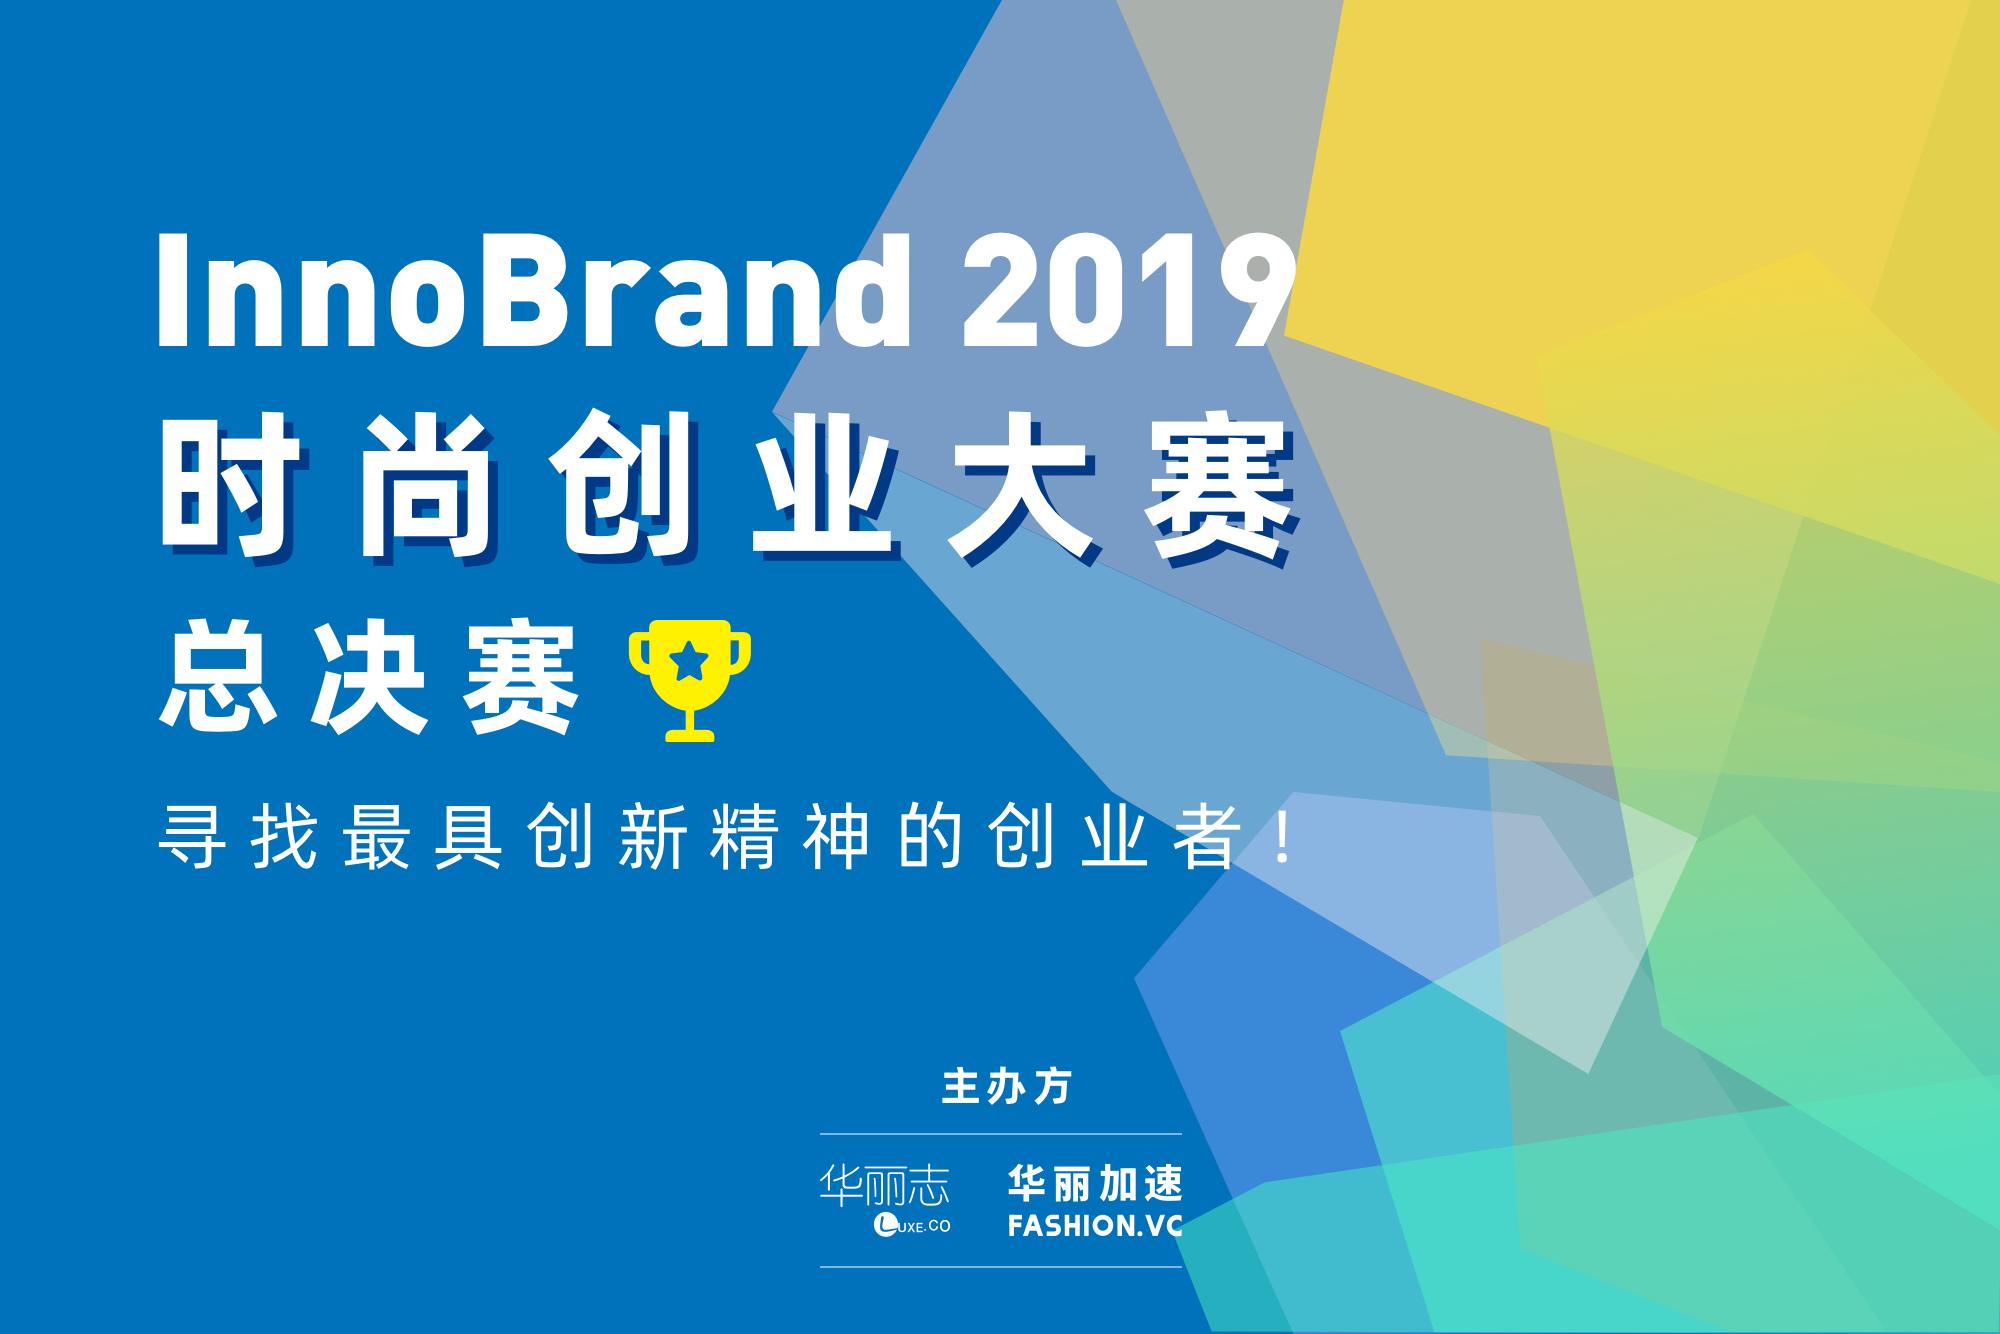 InnoBrand 2019时尚创业大赛总决赛十二强公布!11月29日@北京,仅开放30个观摩席位